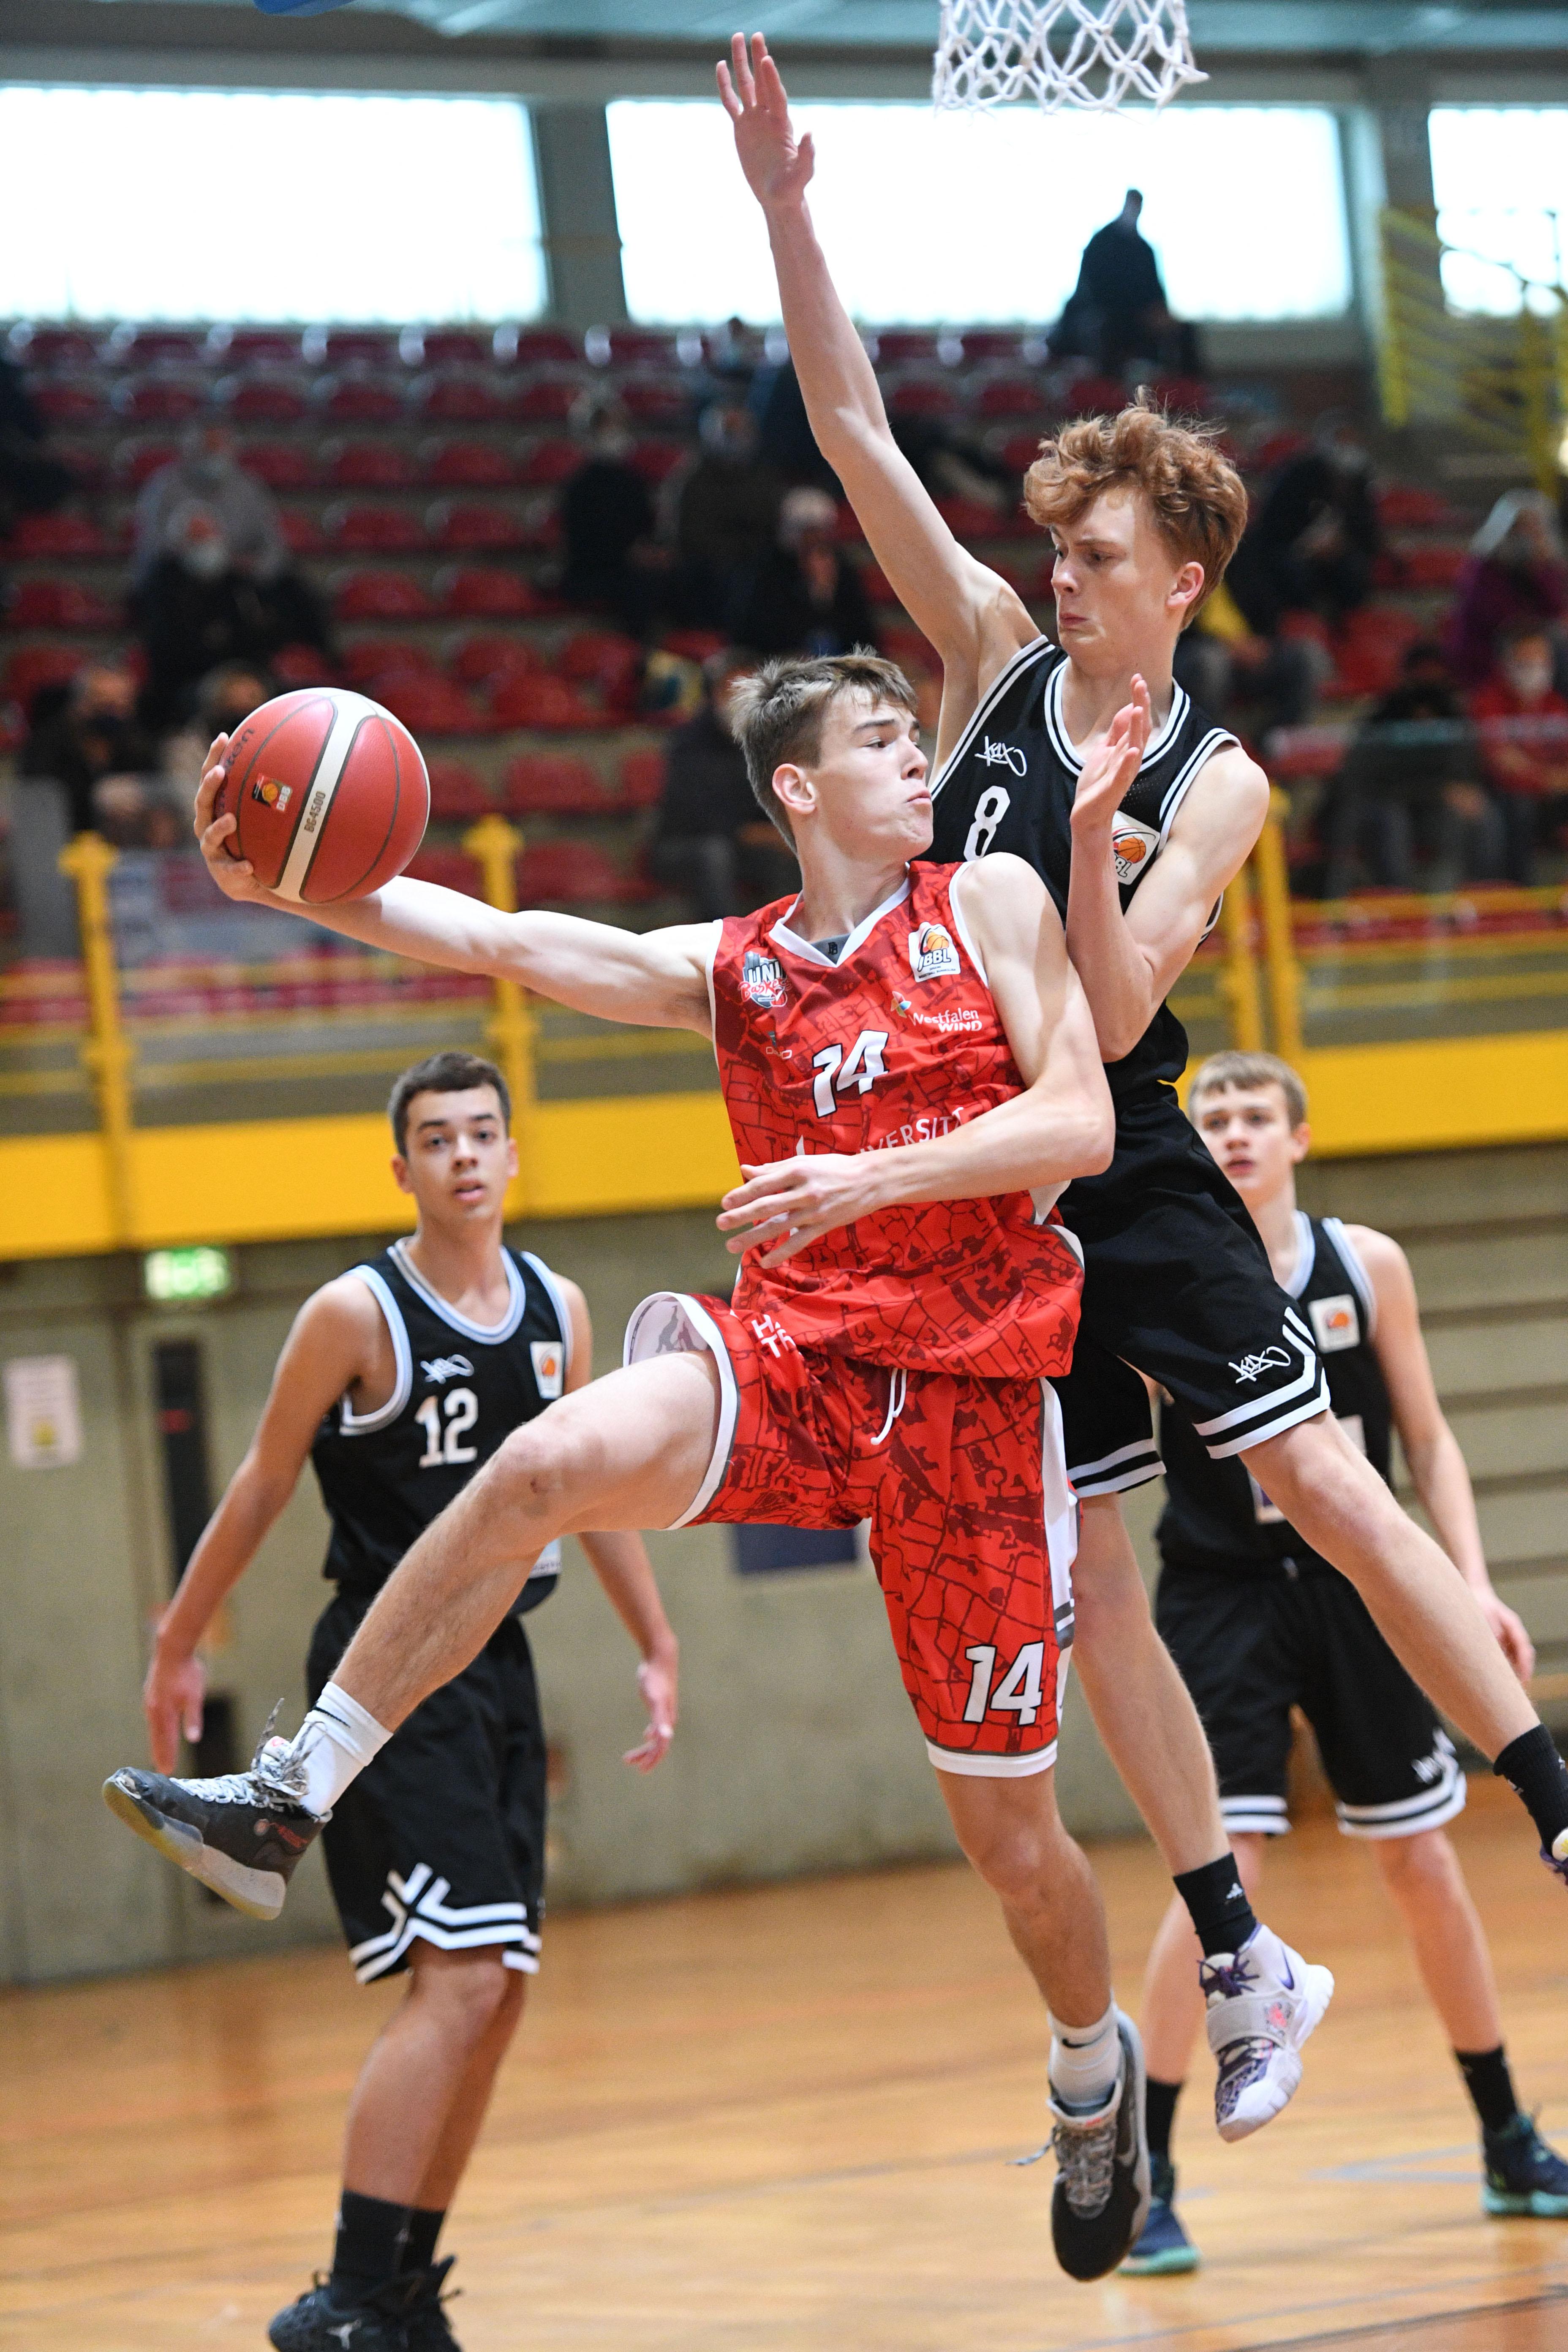 2020-10-18-JBBL-Uni-Baskets-Paderborn-UBC-Muenster_7940